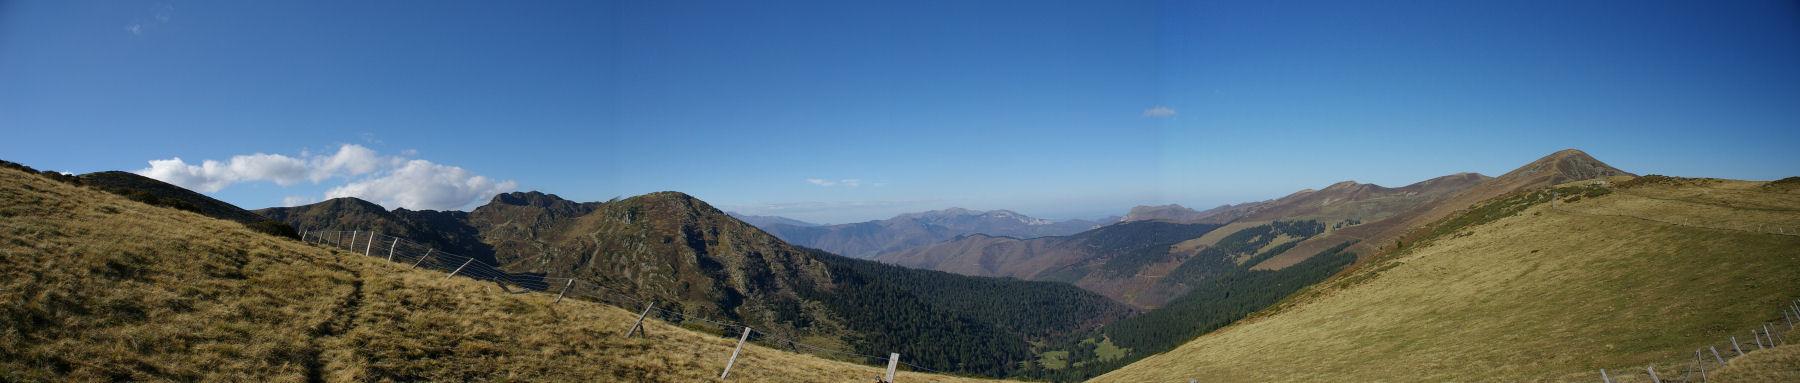 Panorama sur la vallée de Bareille